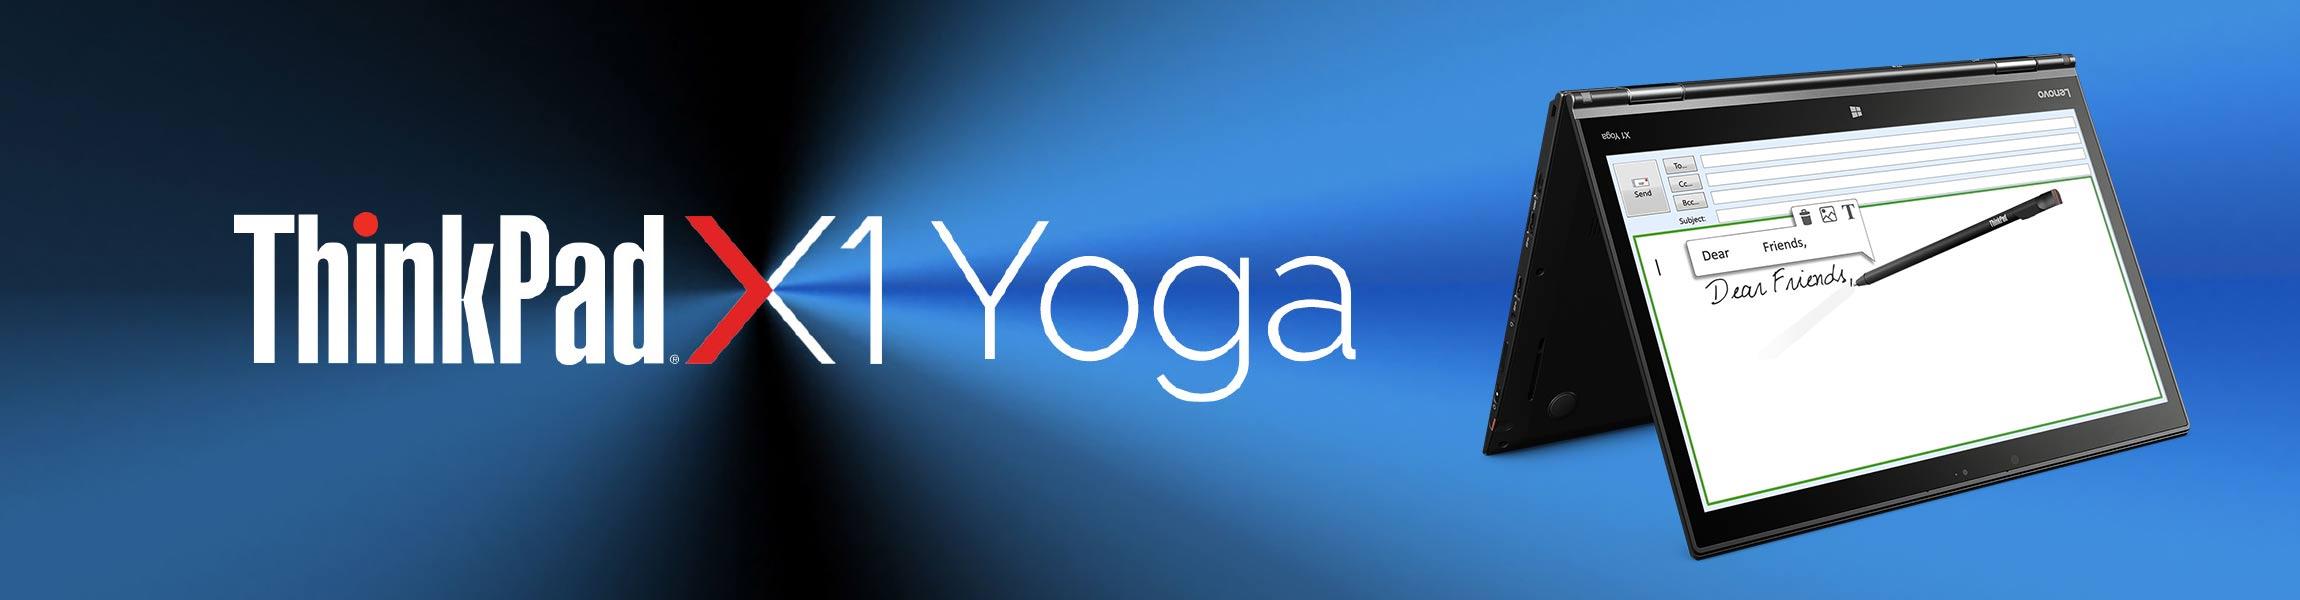 x1-yoga_2